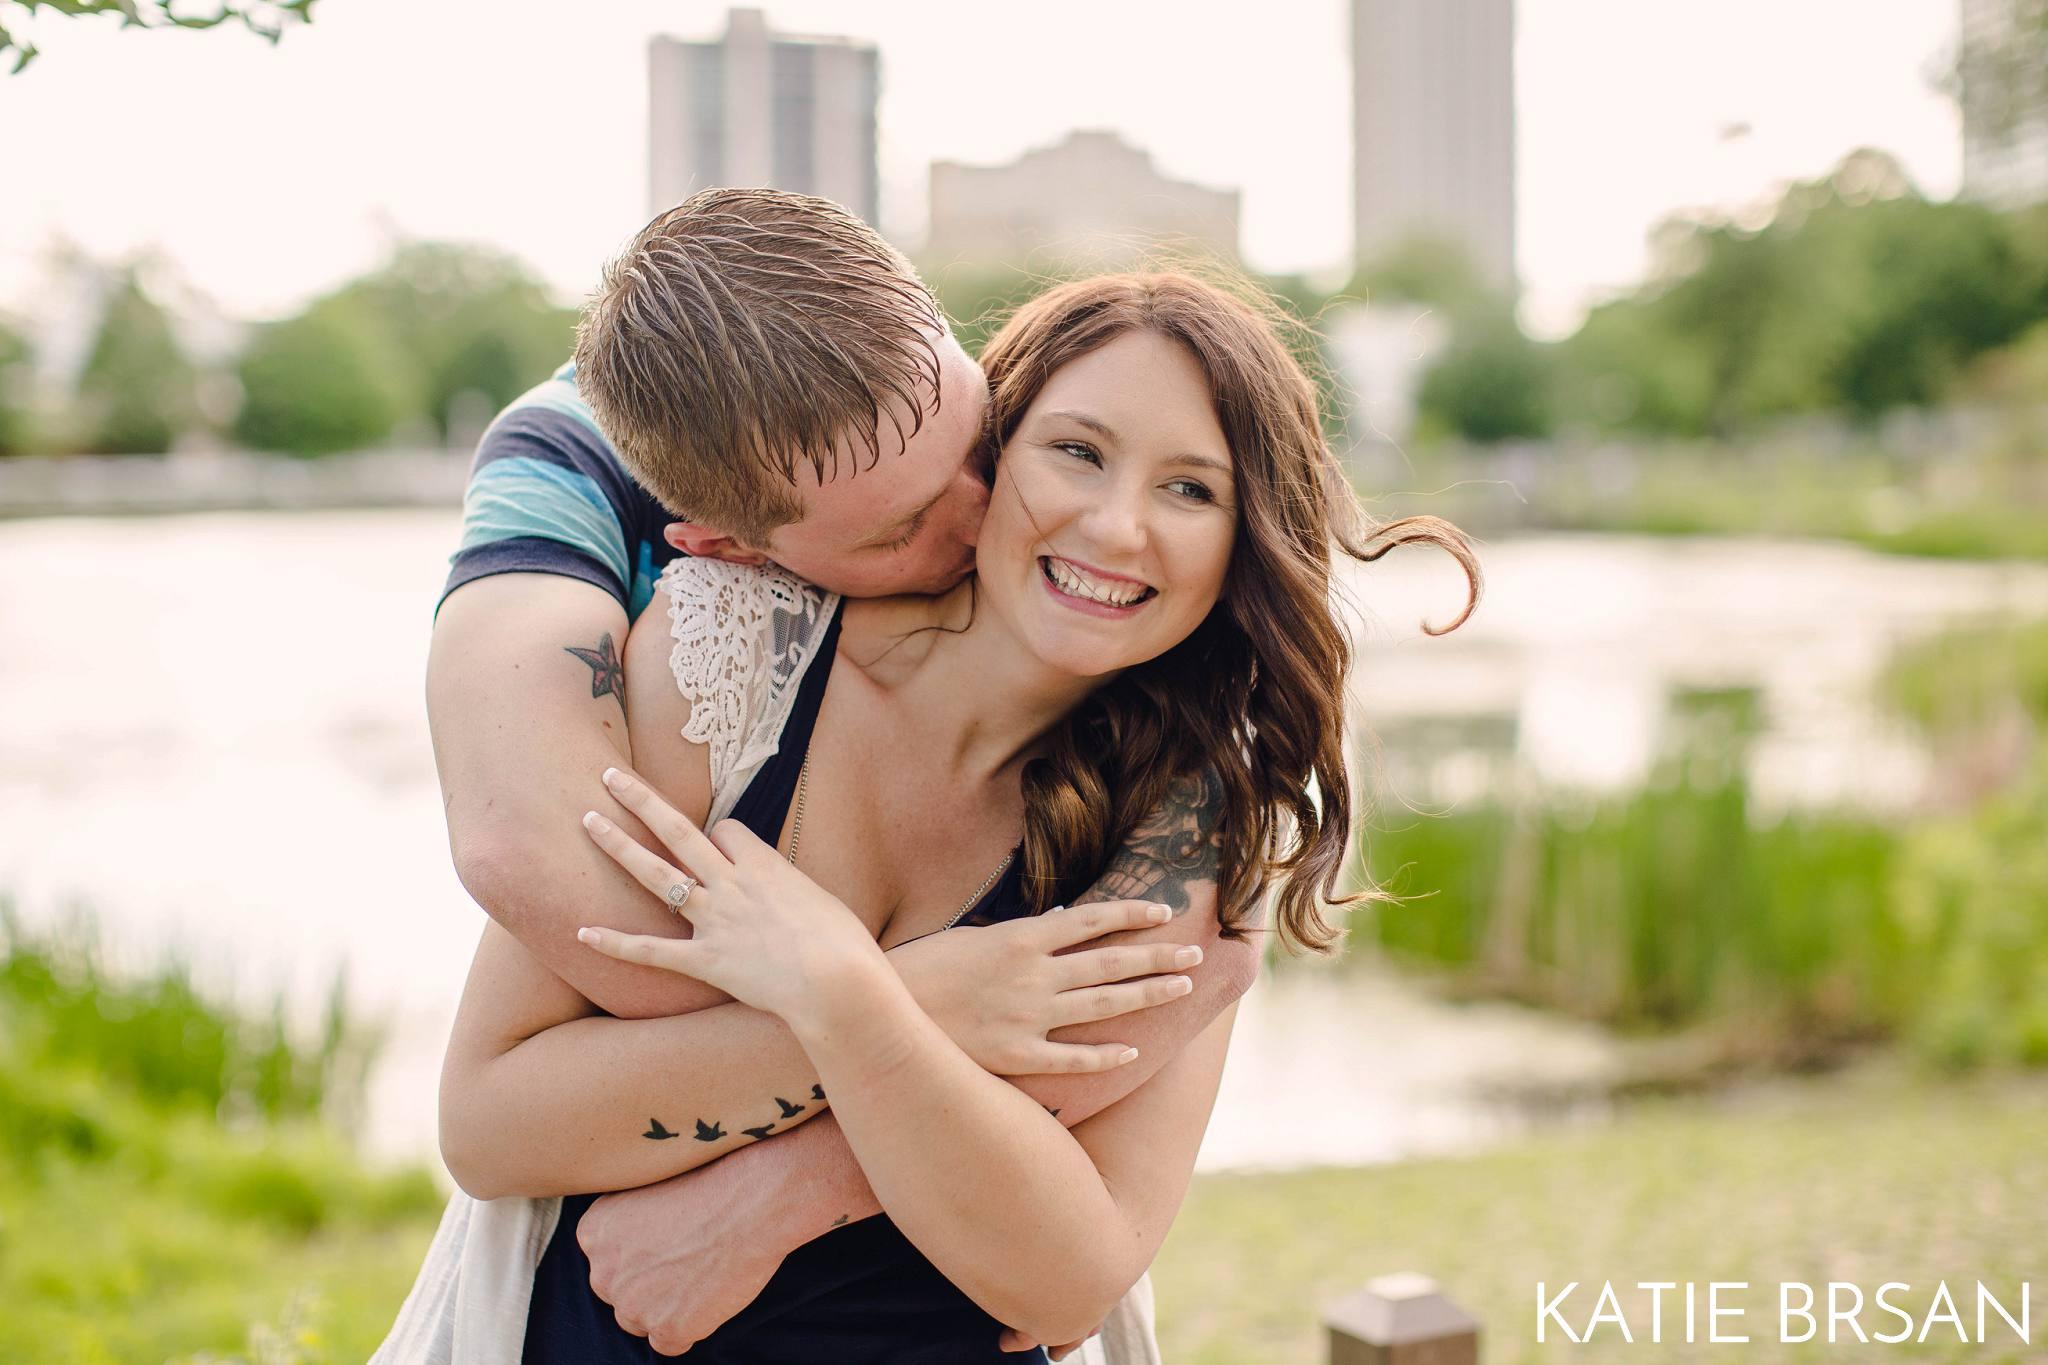 KatieBrsan_Chicago-EngagementSession-LincolnPark_0078.jpg